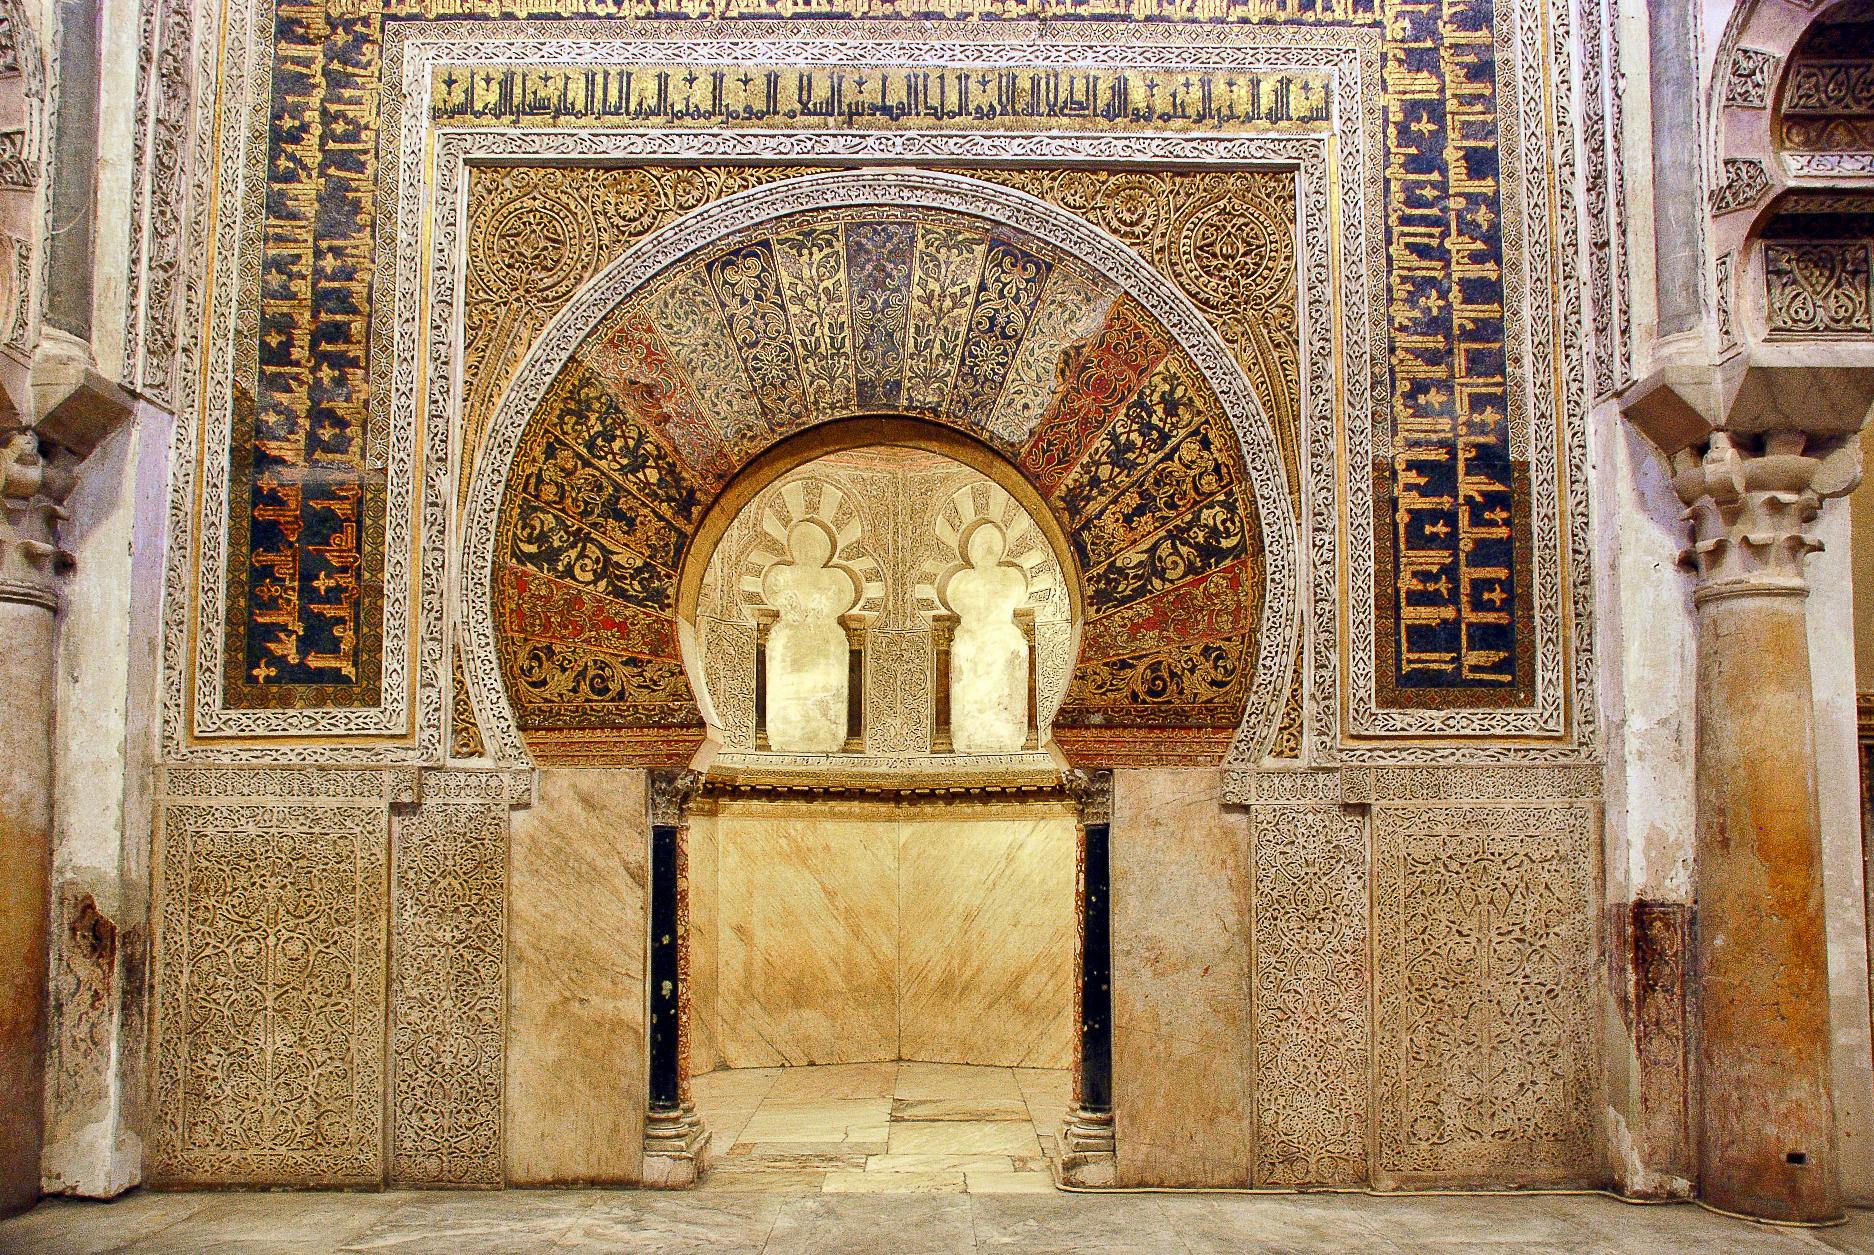 File:Cordoba, la Mezquita - Mihrab.jpg - Wikimedia Commons